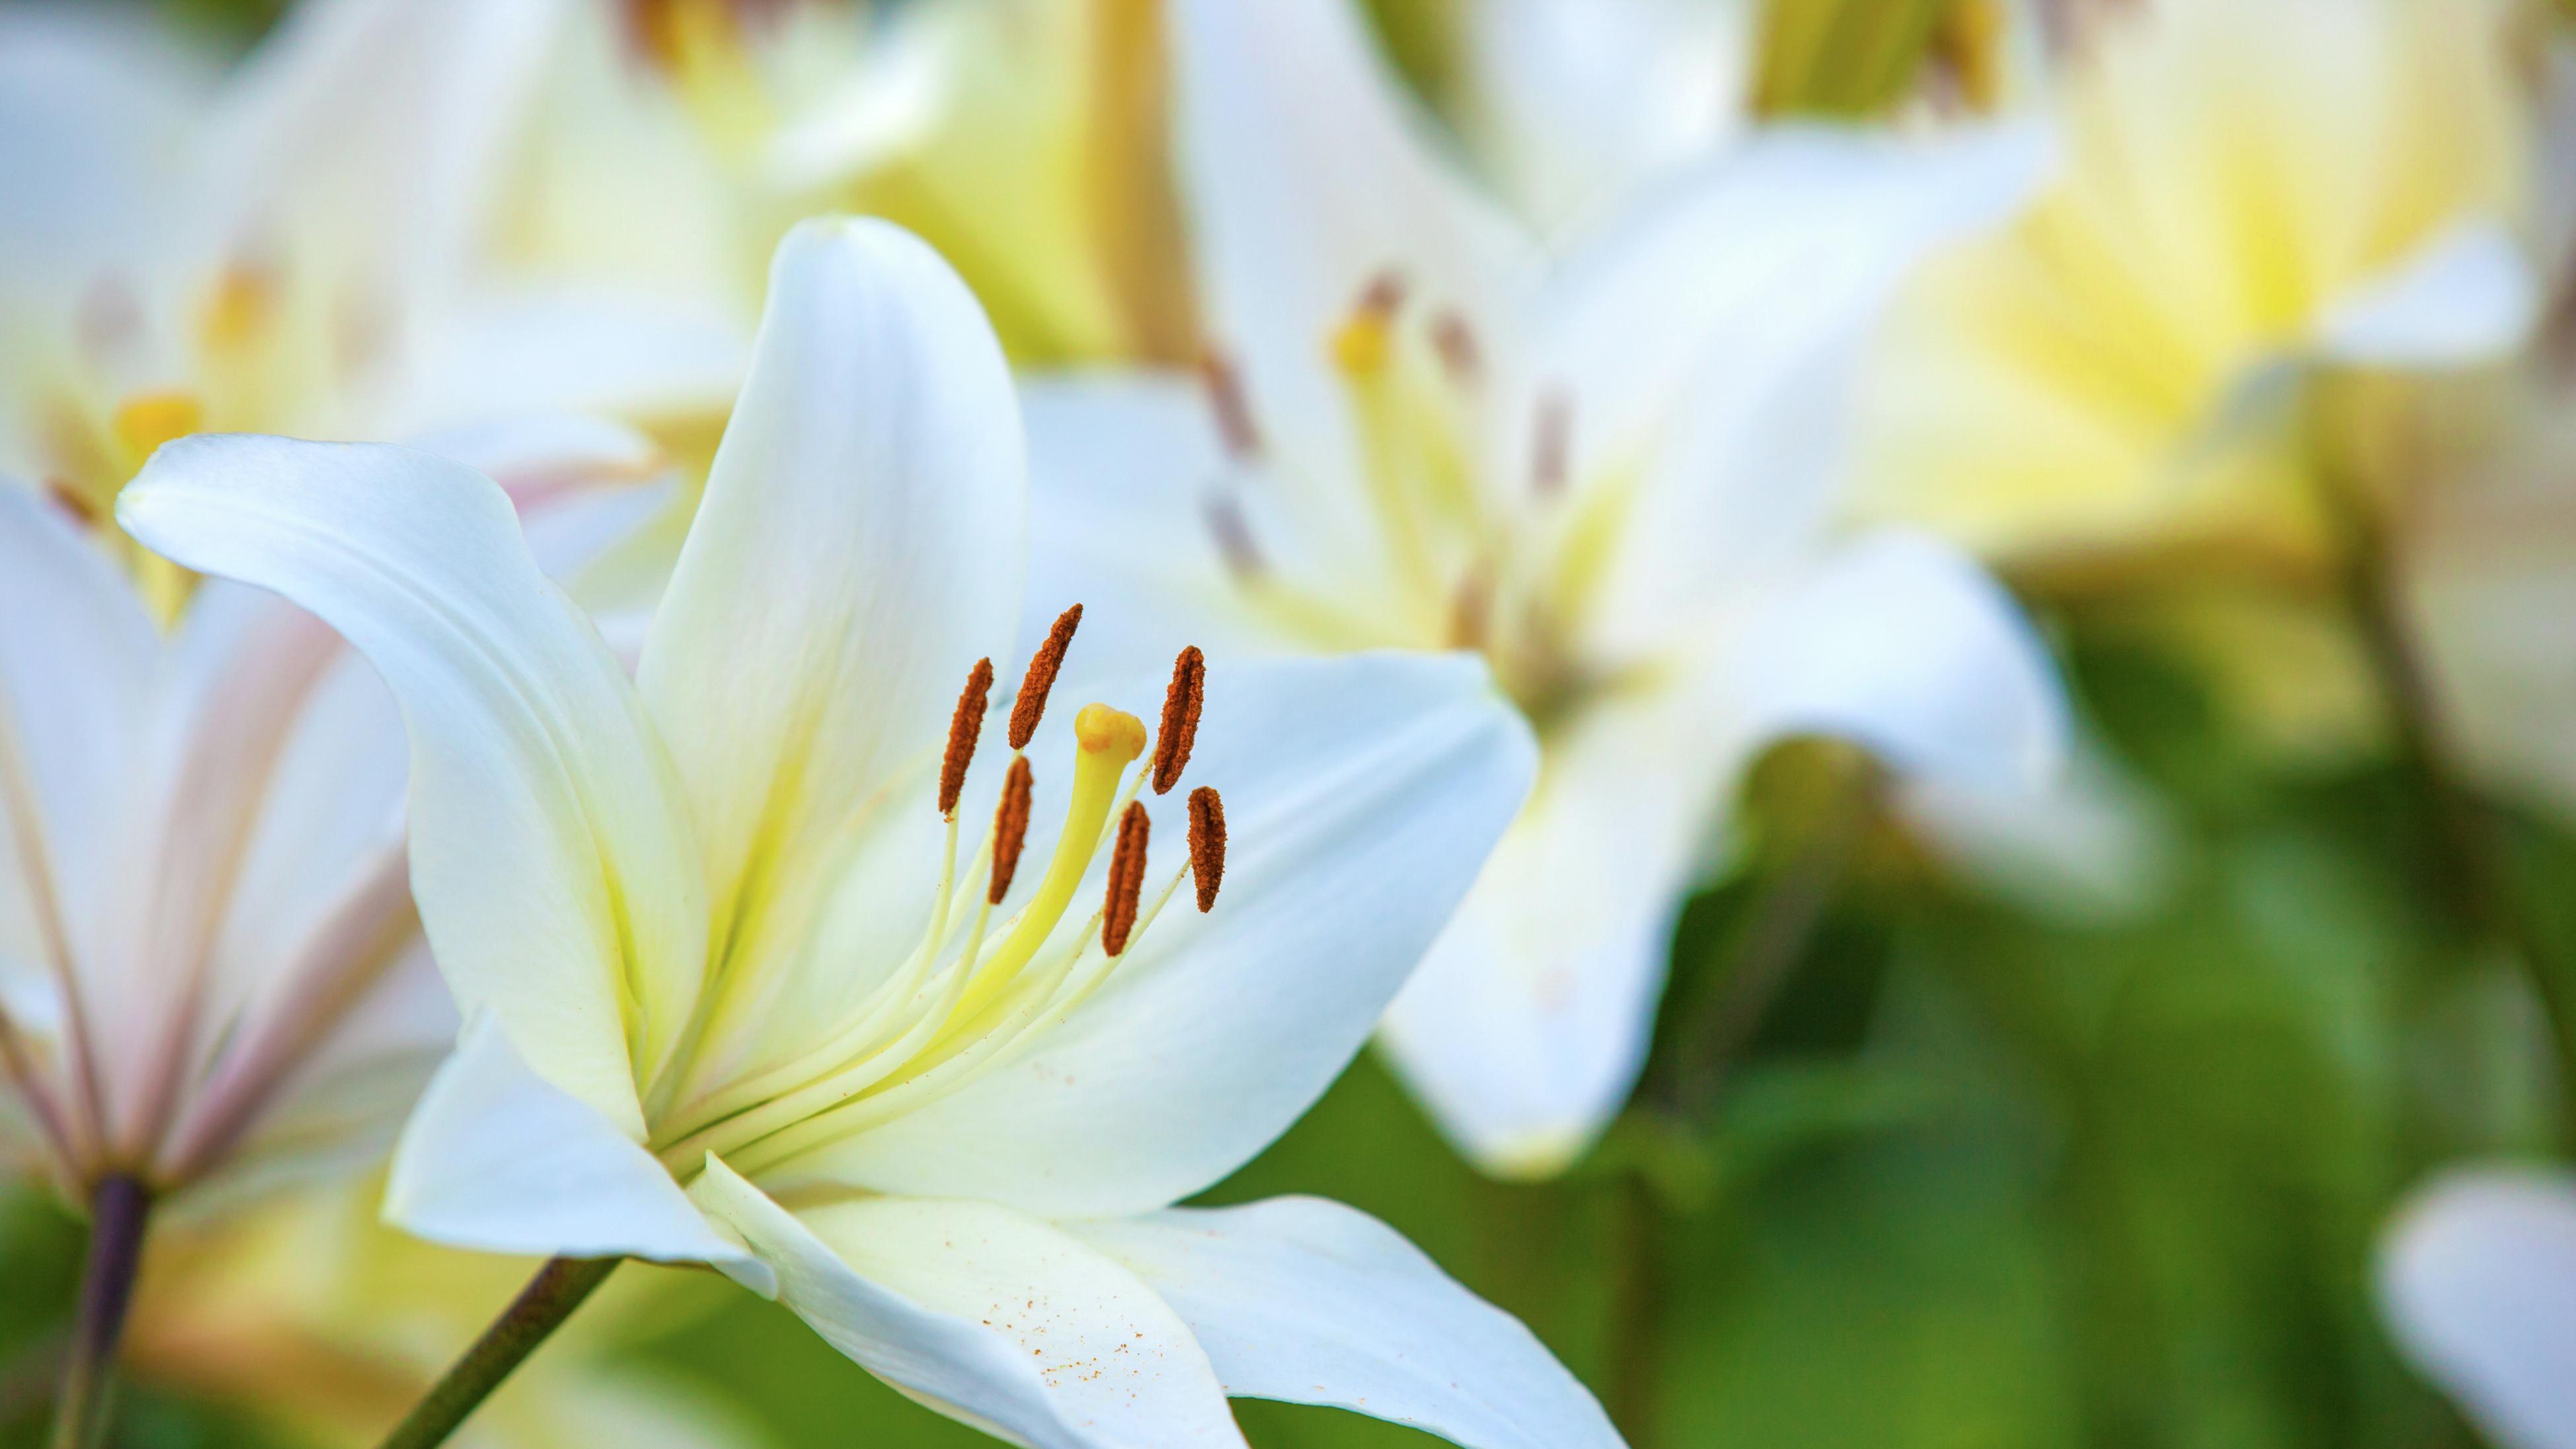 Lilies close up.